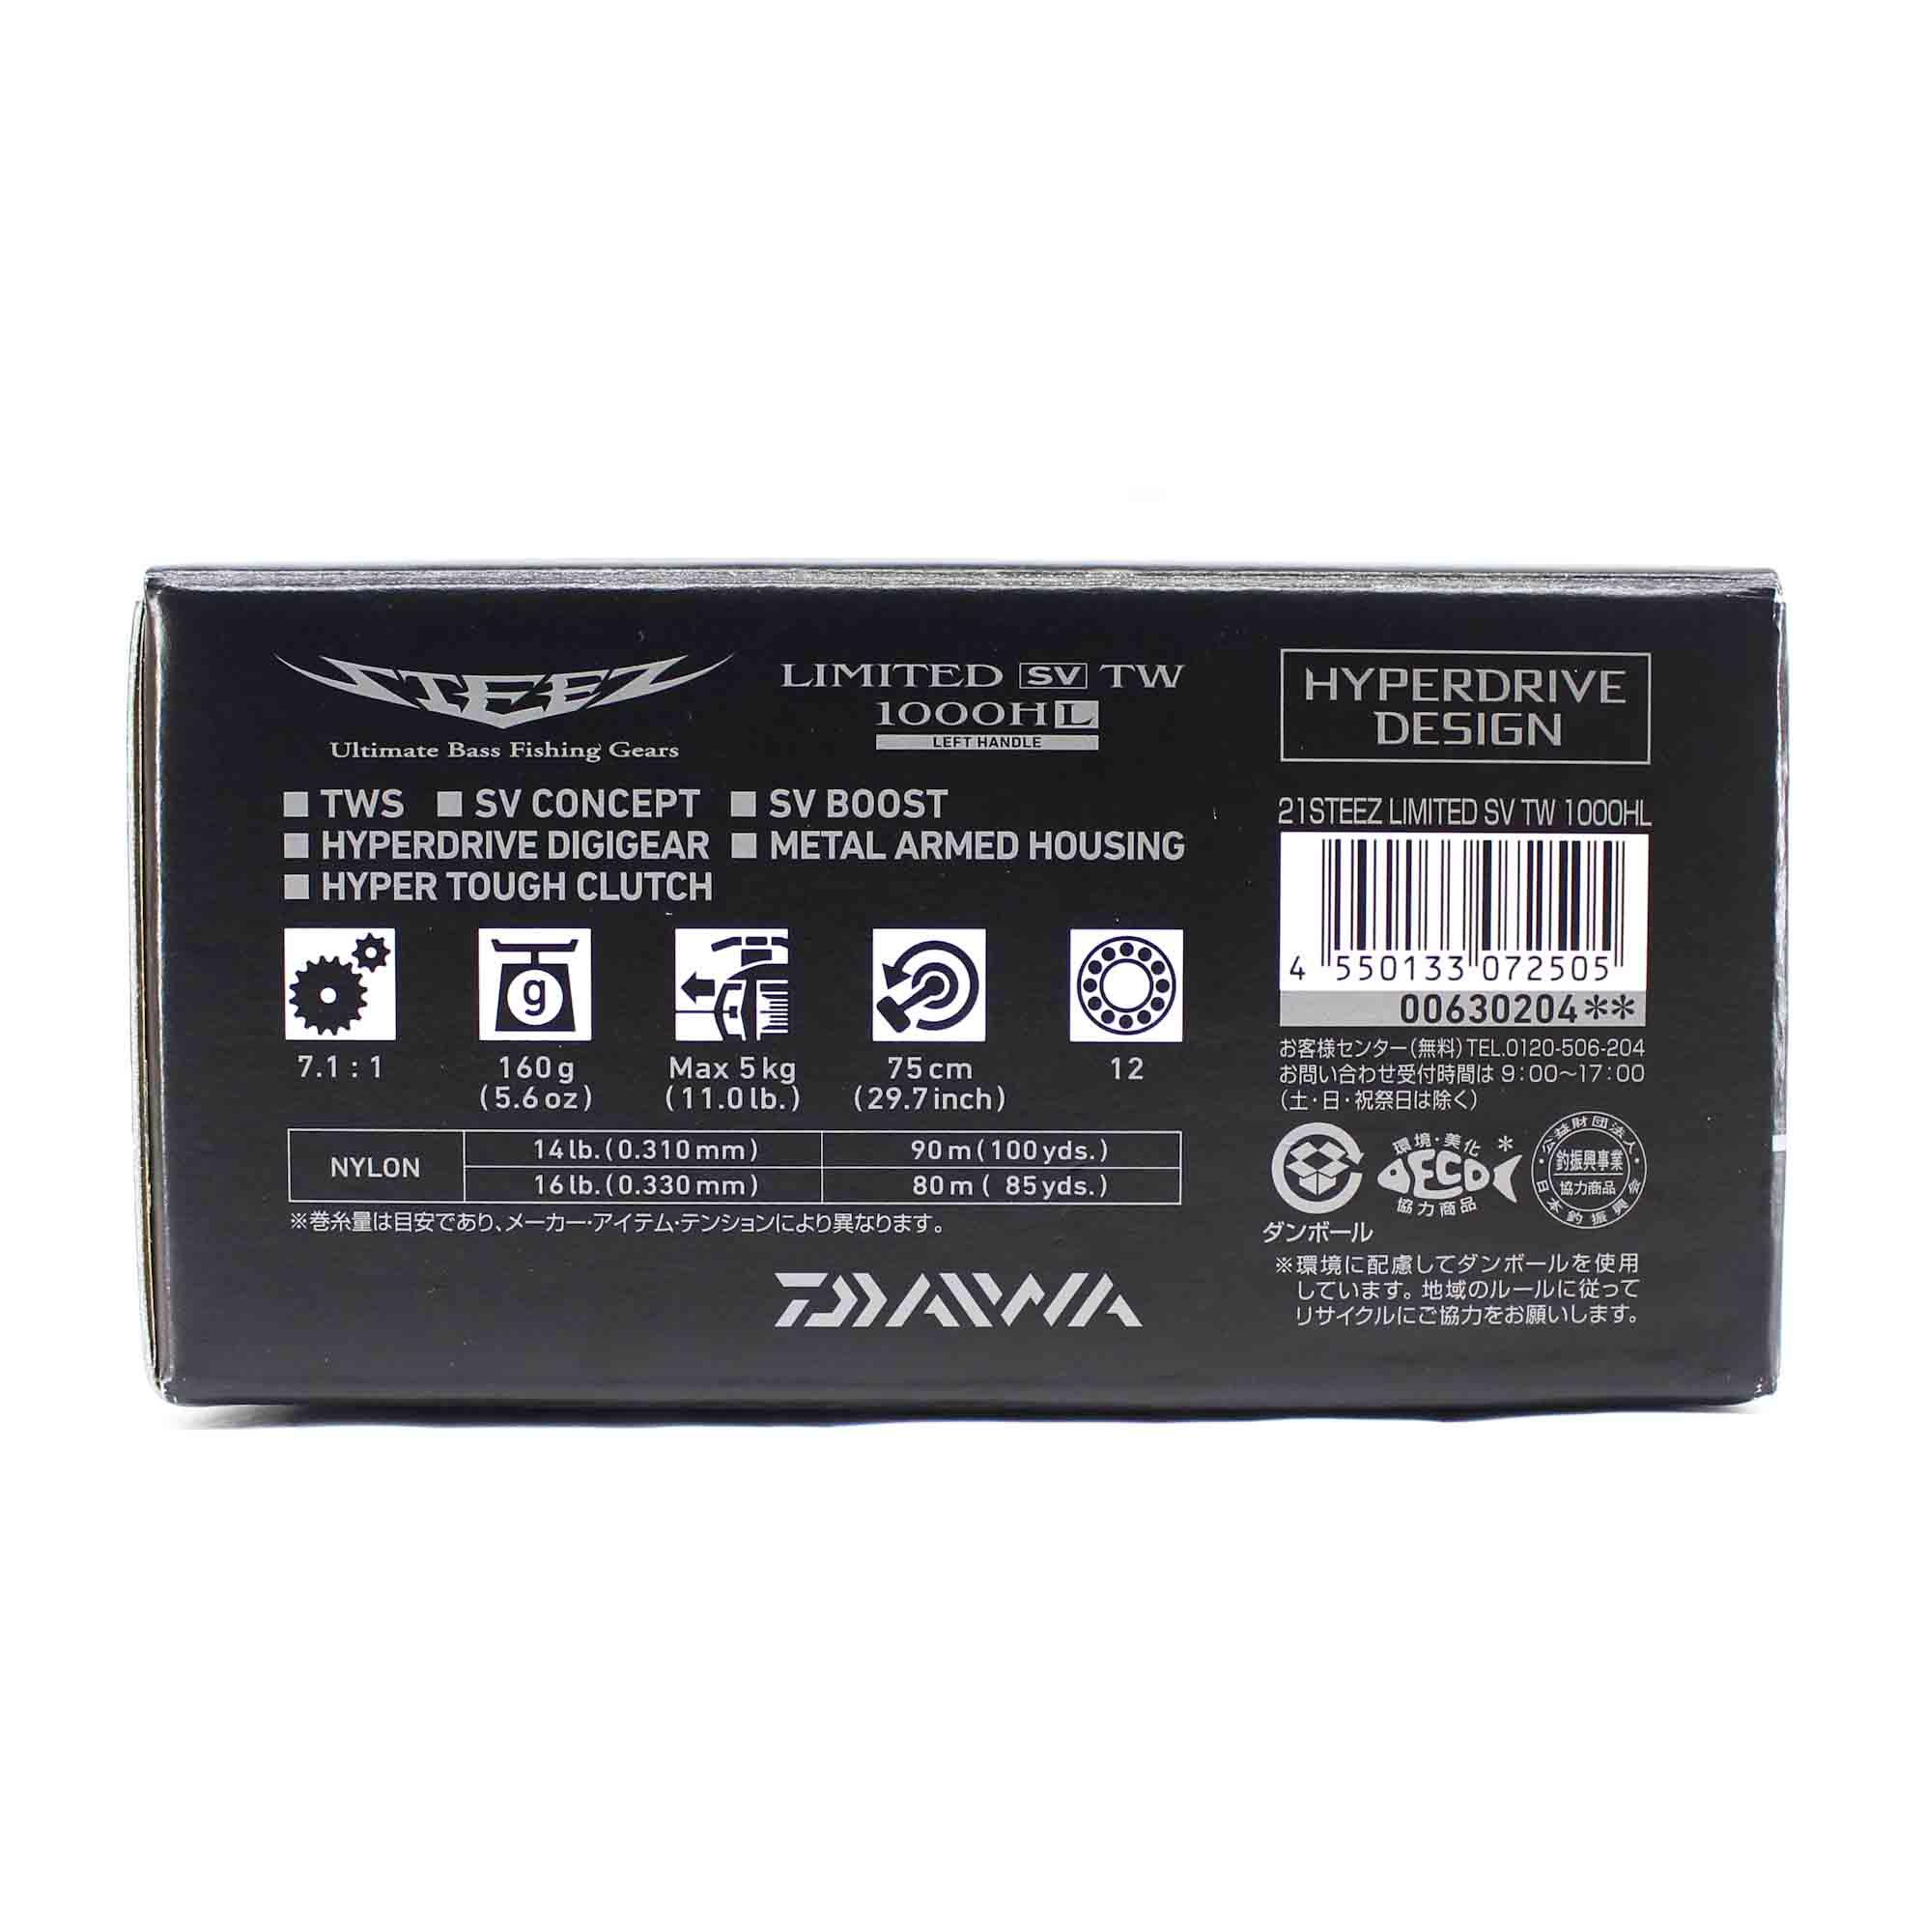 Daiwa Reel Baitcast 21 Steez Limited SV TW 1000 HL Left Hand (2505)